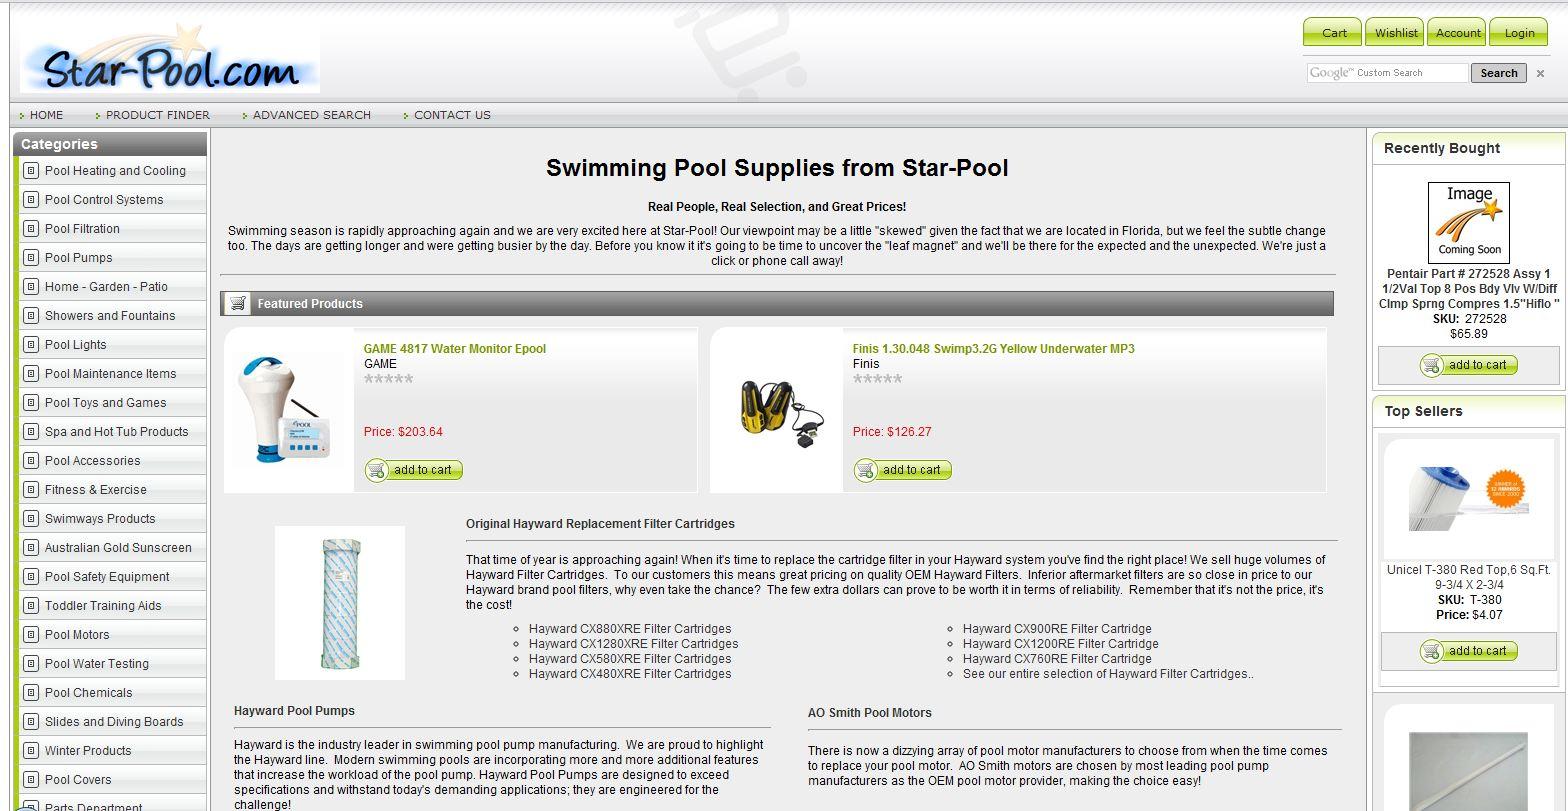 Star-pool.com